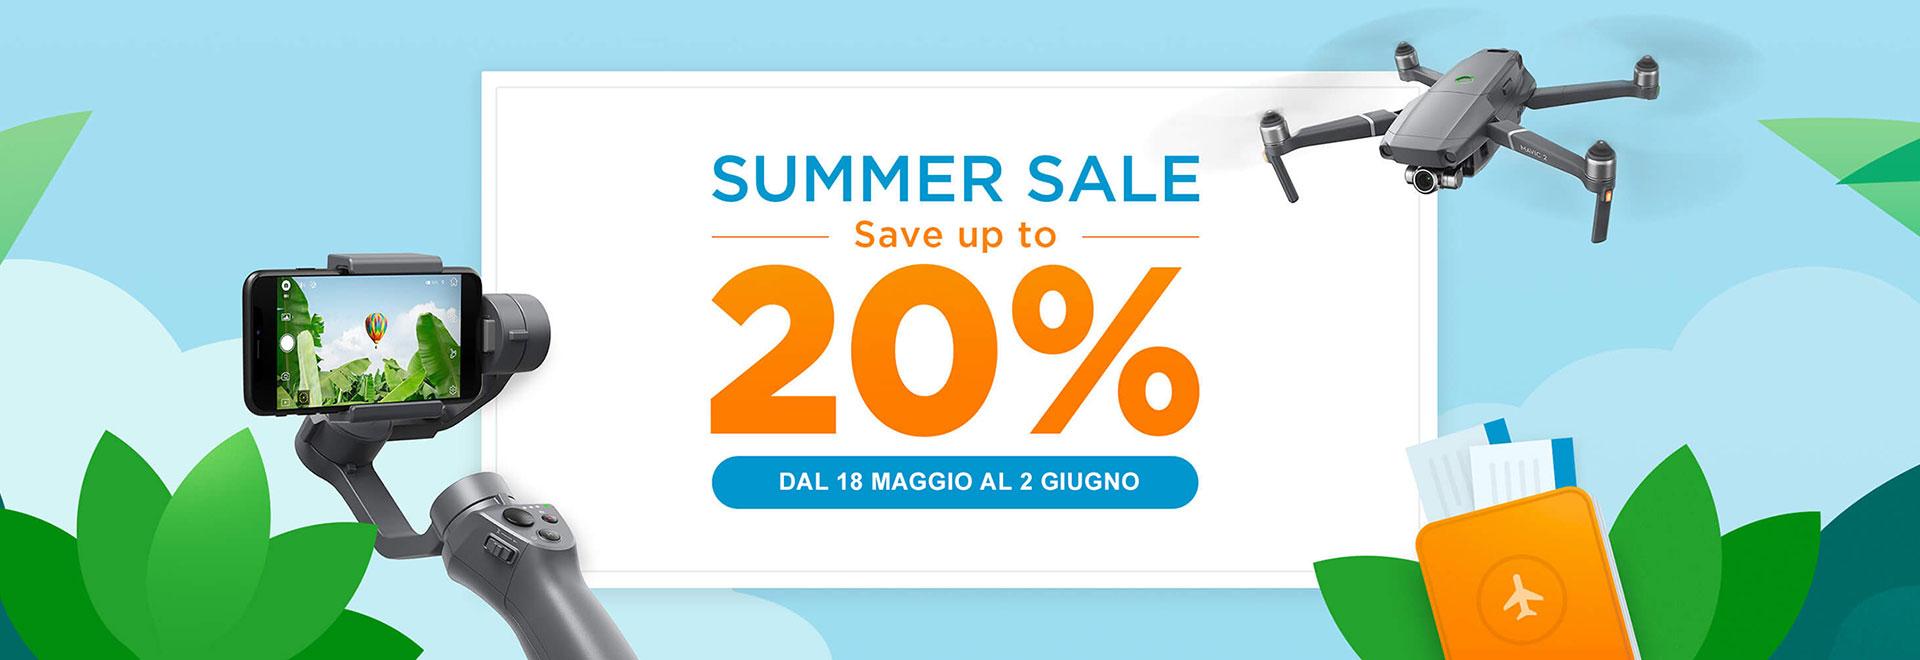 DJI Summer Sale 2019